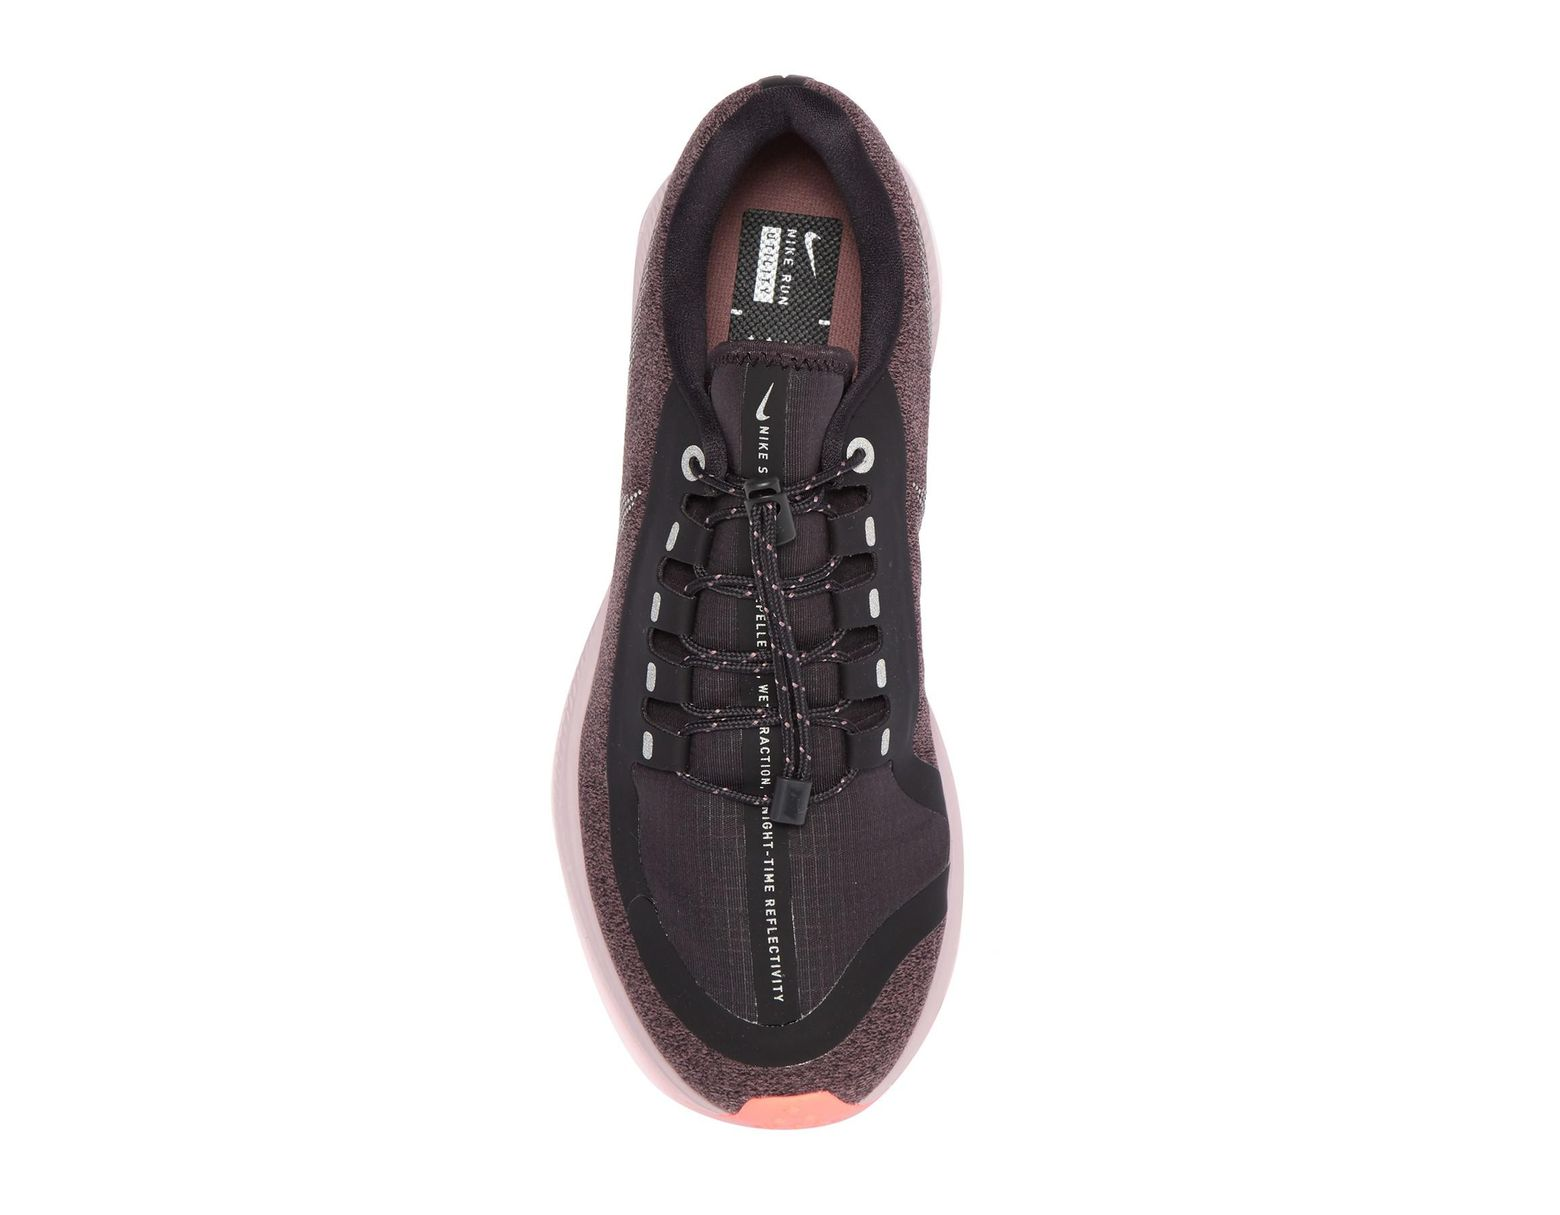 6812ca4b62e7 Lyst - Nike Zoom Winflo 5 Run Shield Athletic Shoe